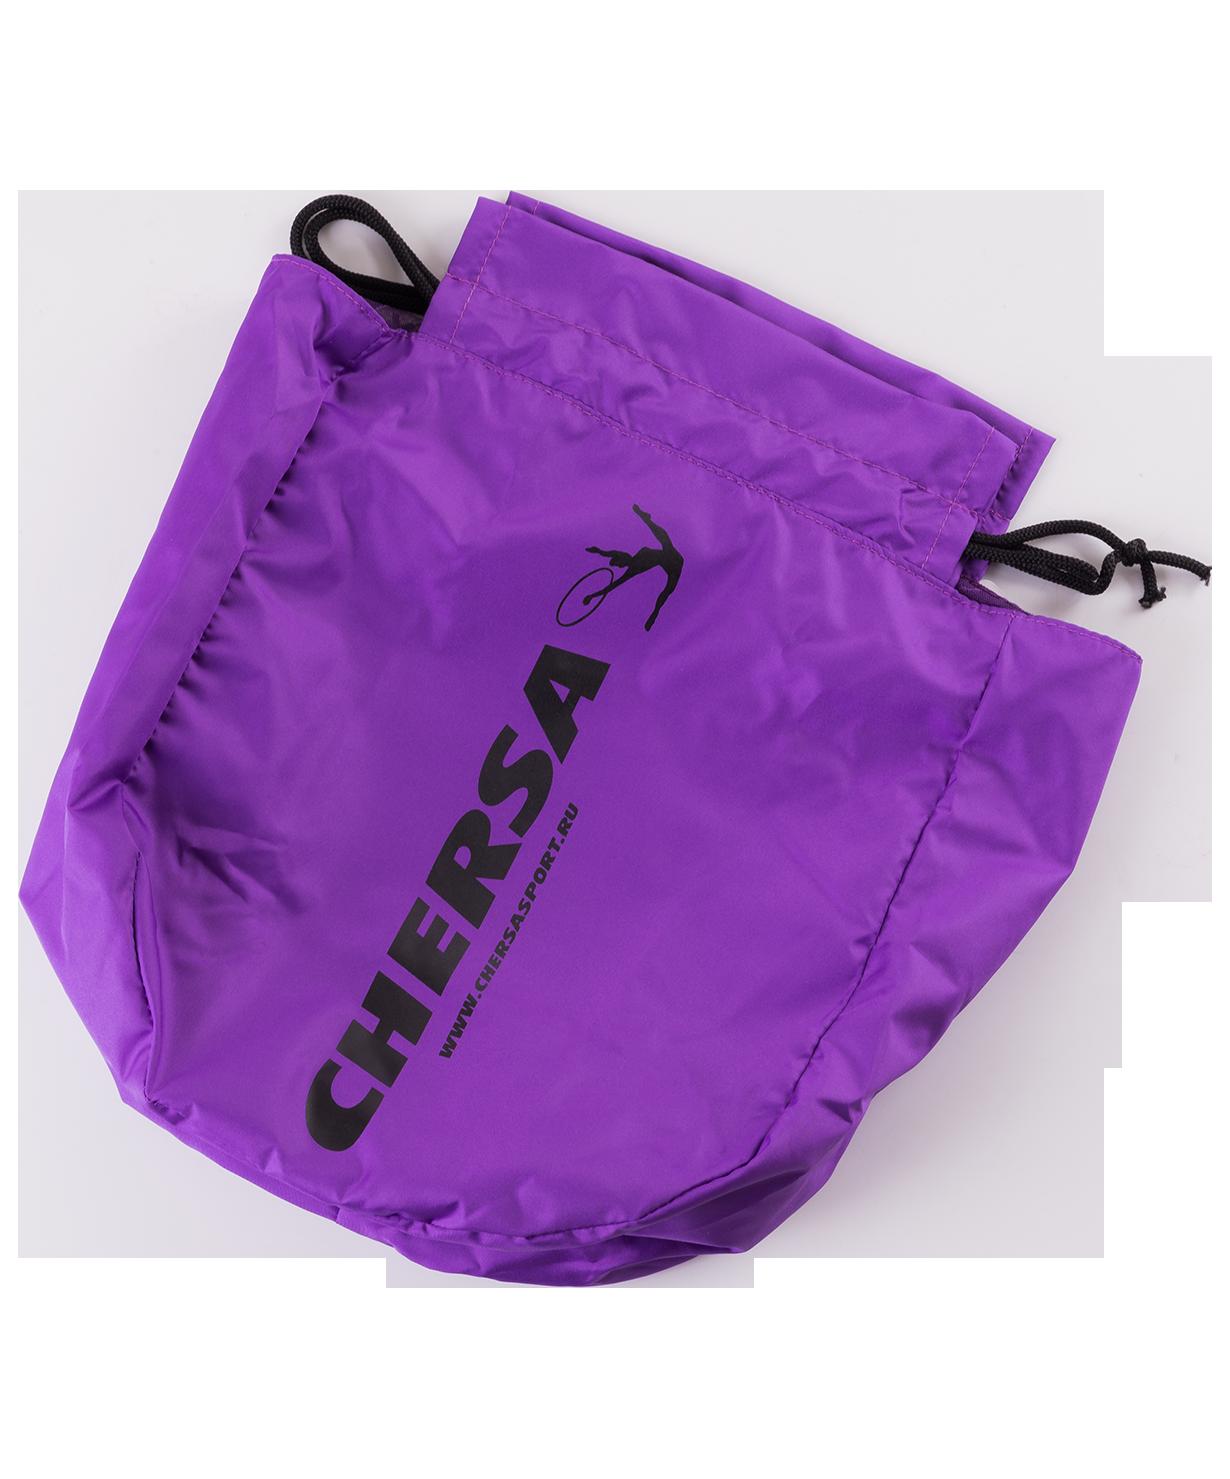 картинка Чехол для гимнастического мяча от магазина Одежда+